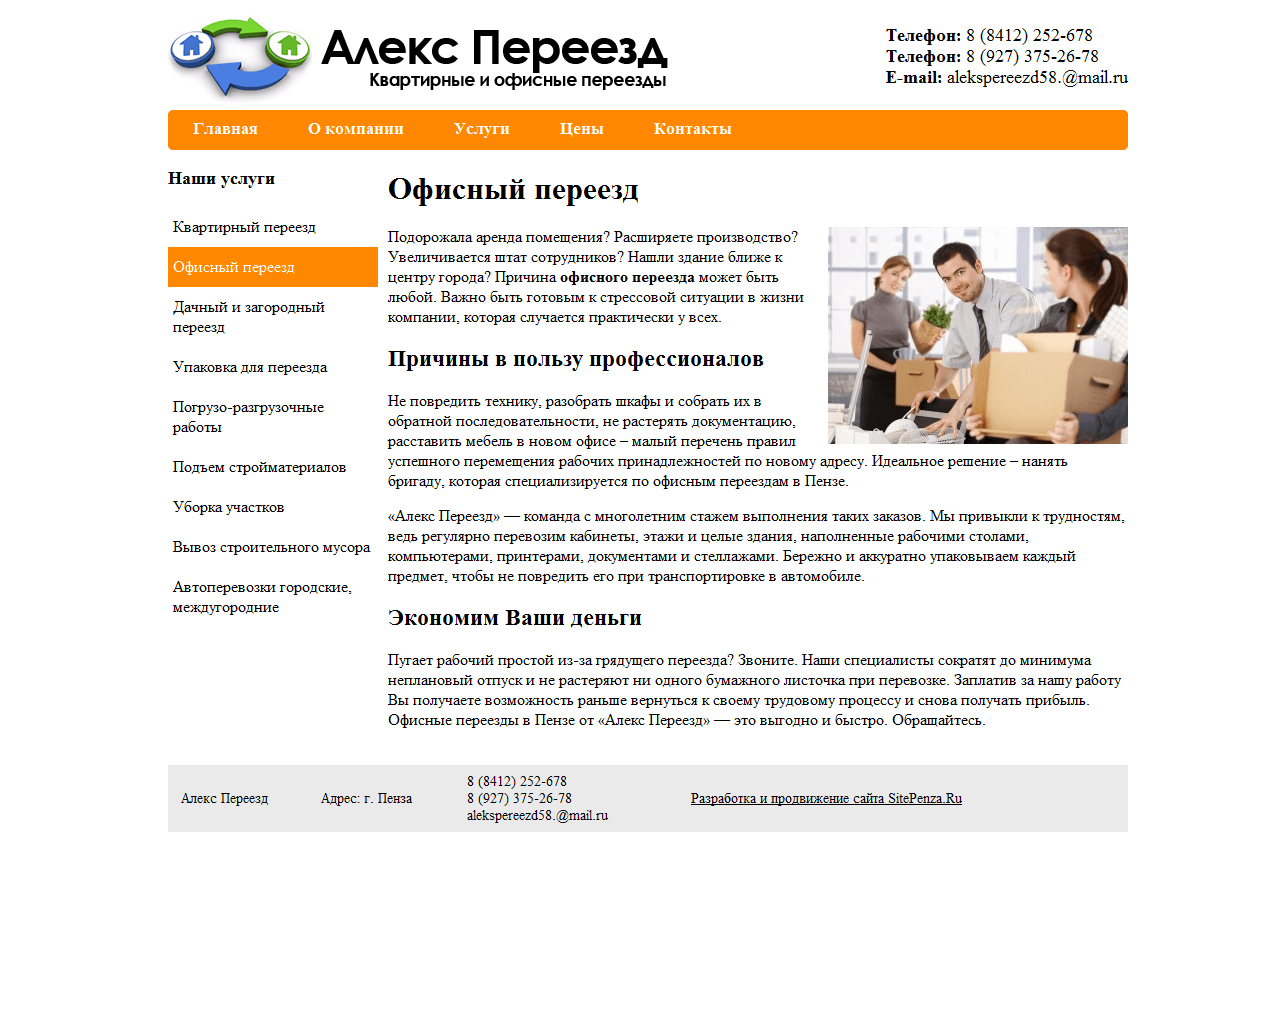 Компания «Алекс Переезд» Пенза